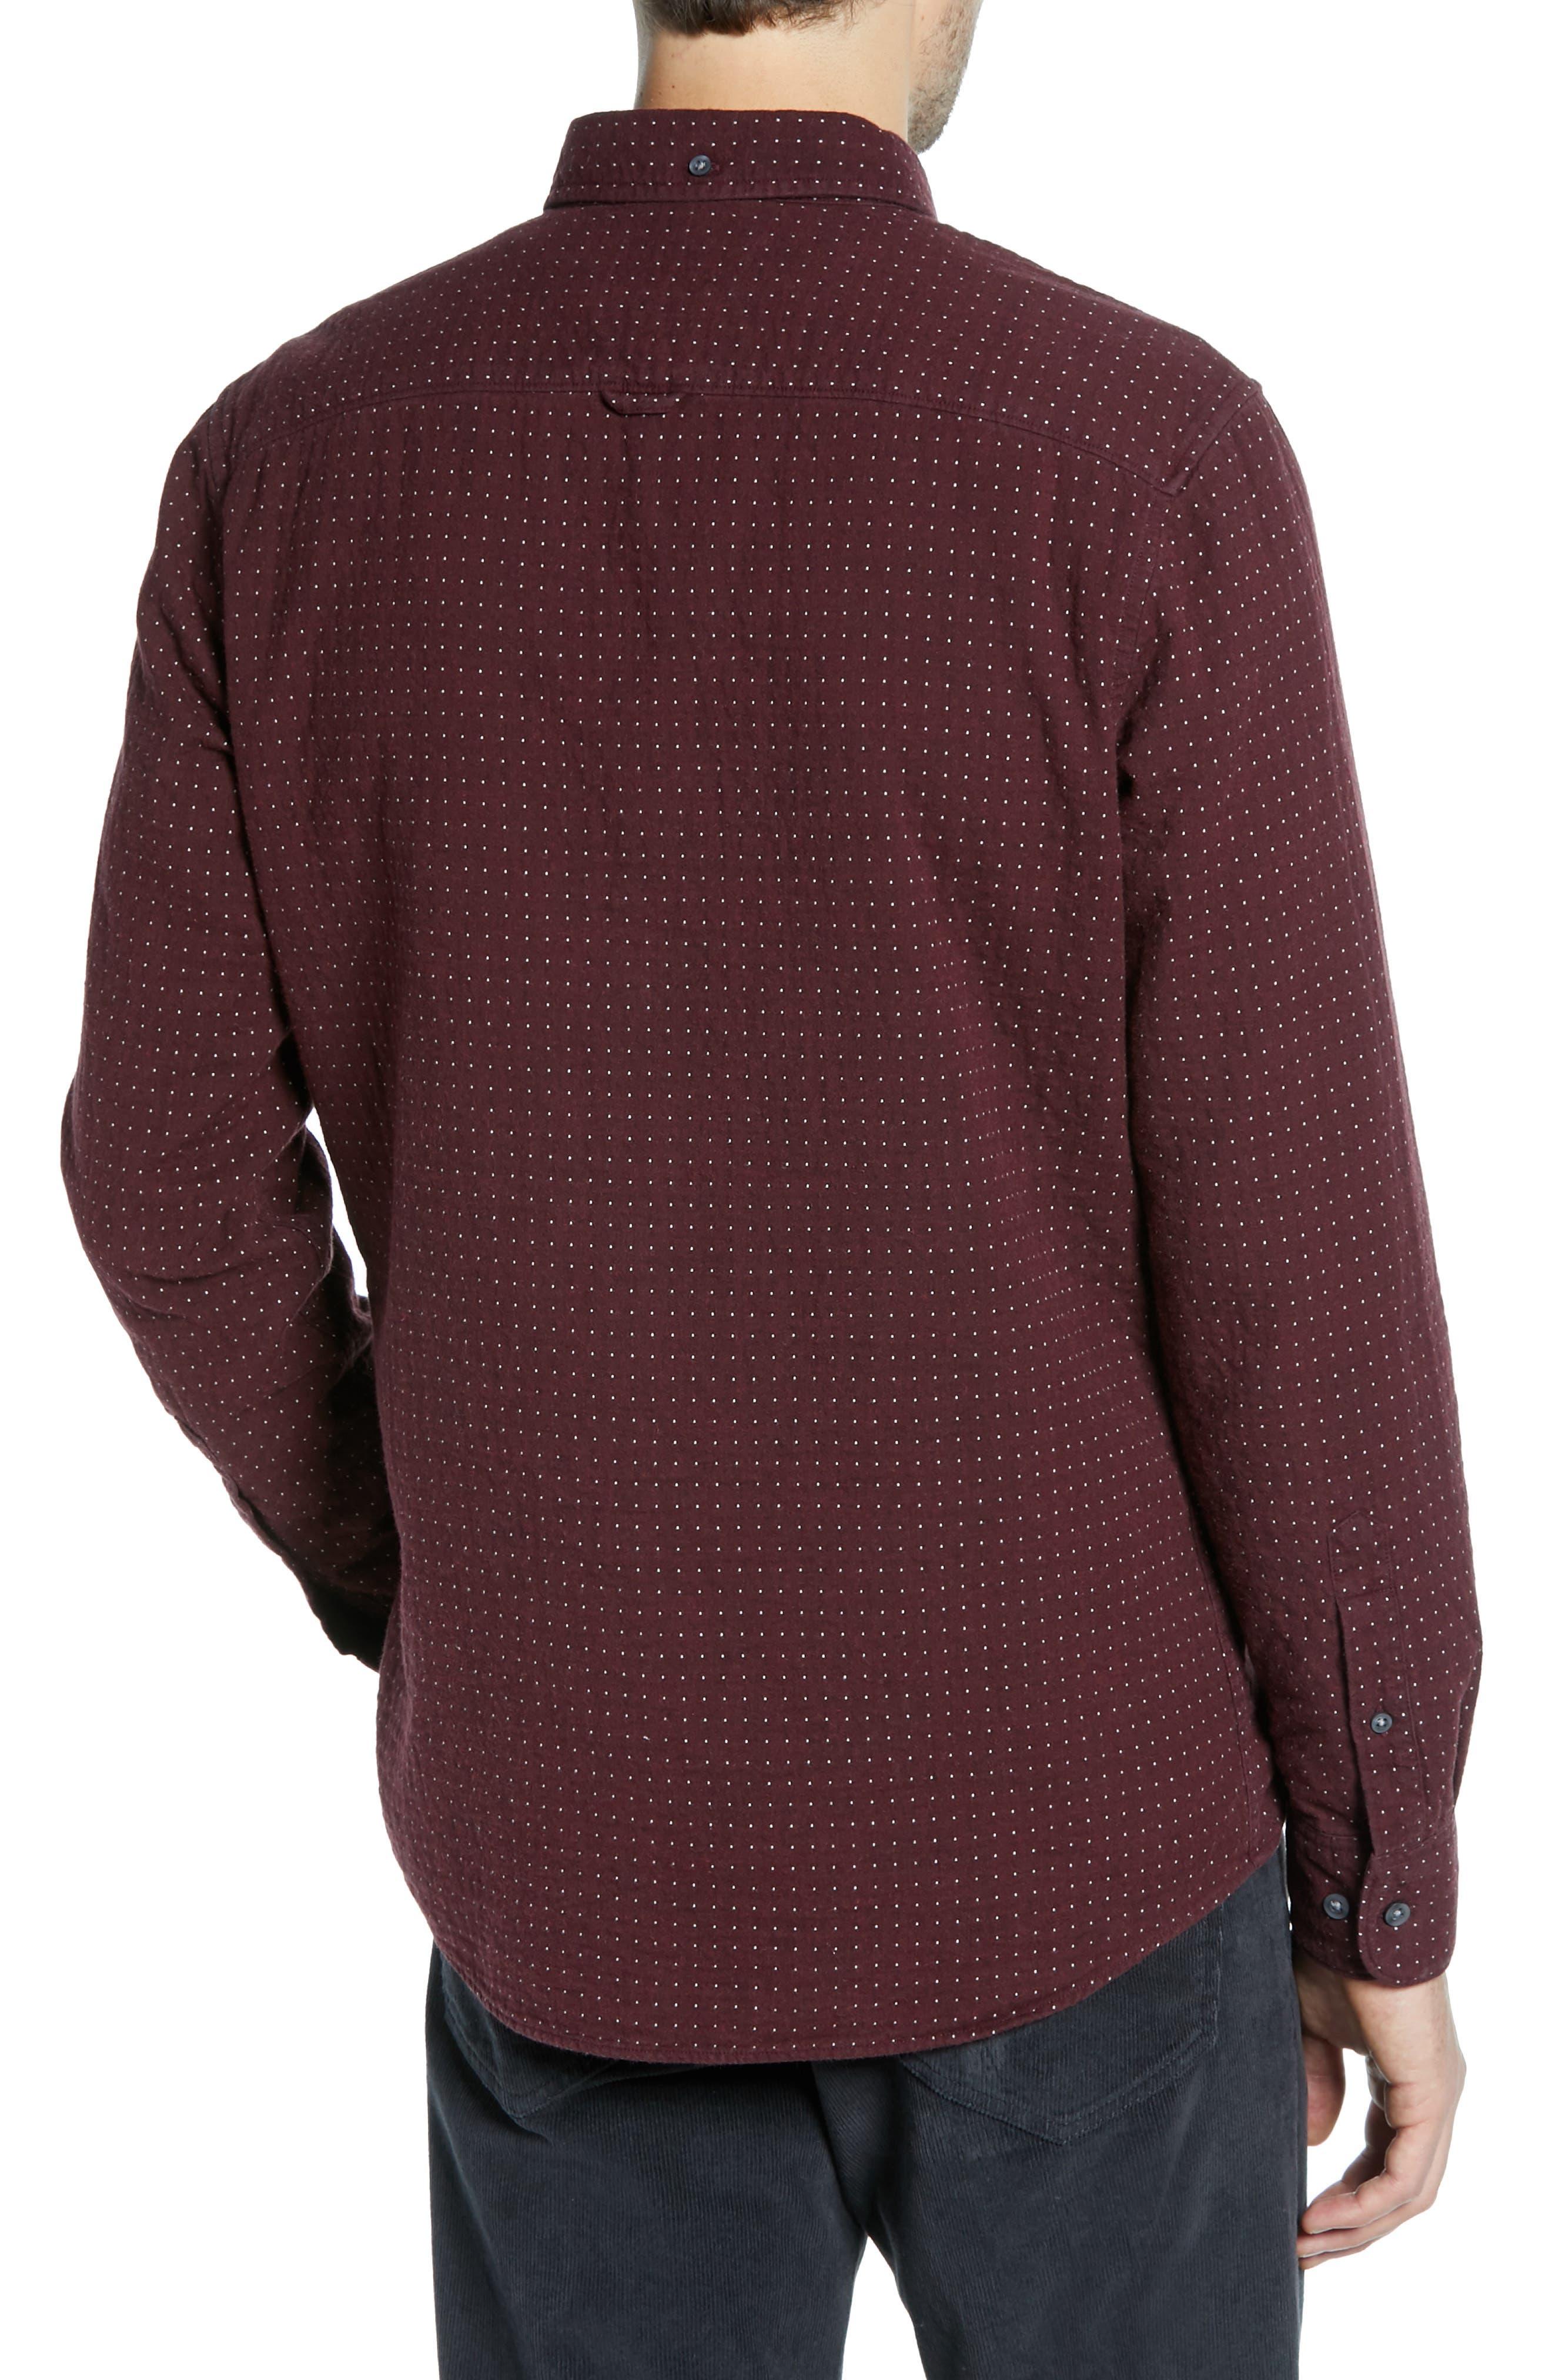 Trim Fit Dot Flannel Sport Shirt,                             Alternate thumbnail 3, color,                             BURGUNDY ROYALE GREY DUOFOLD